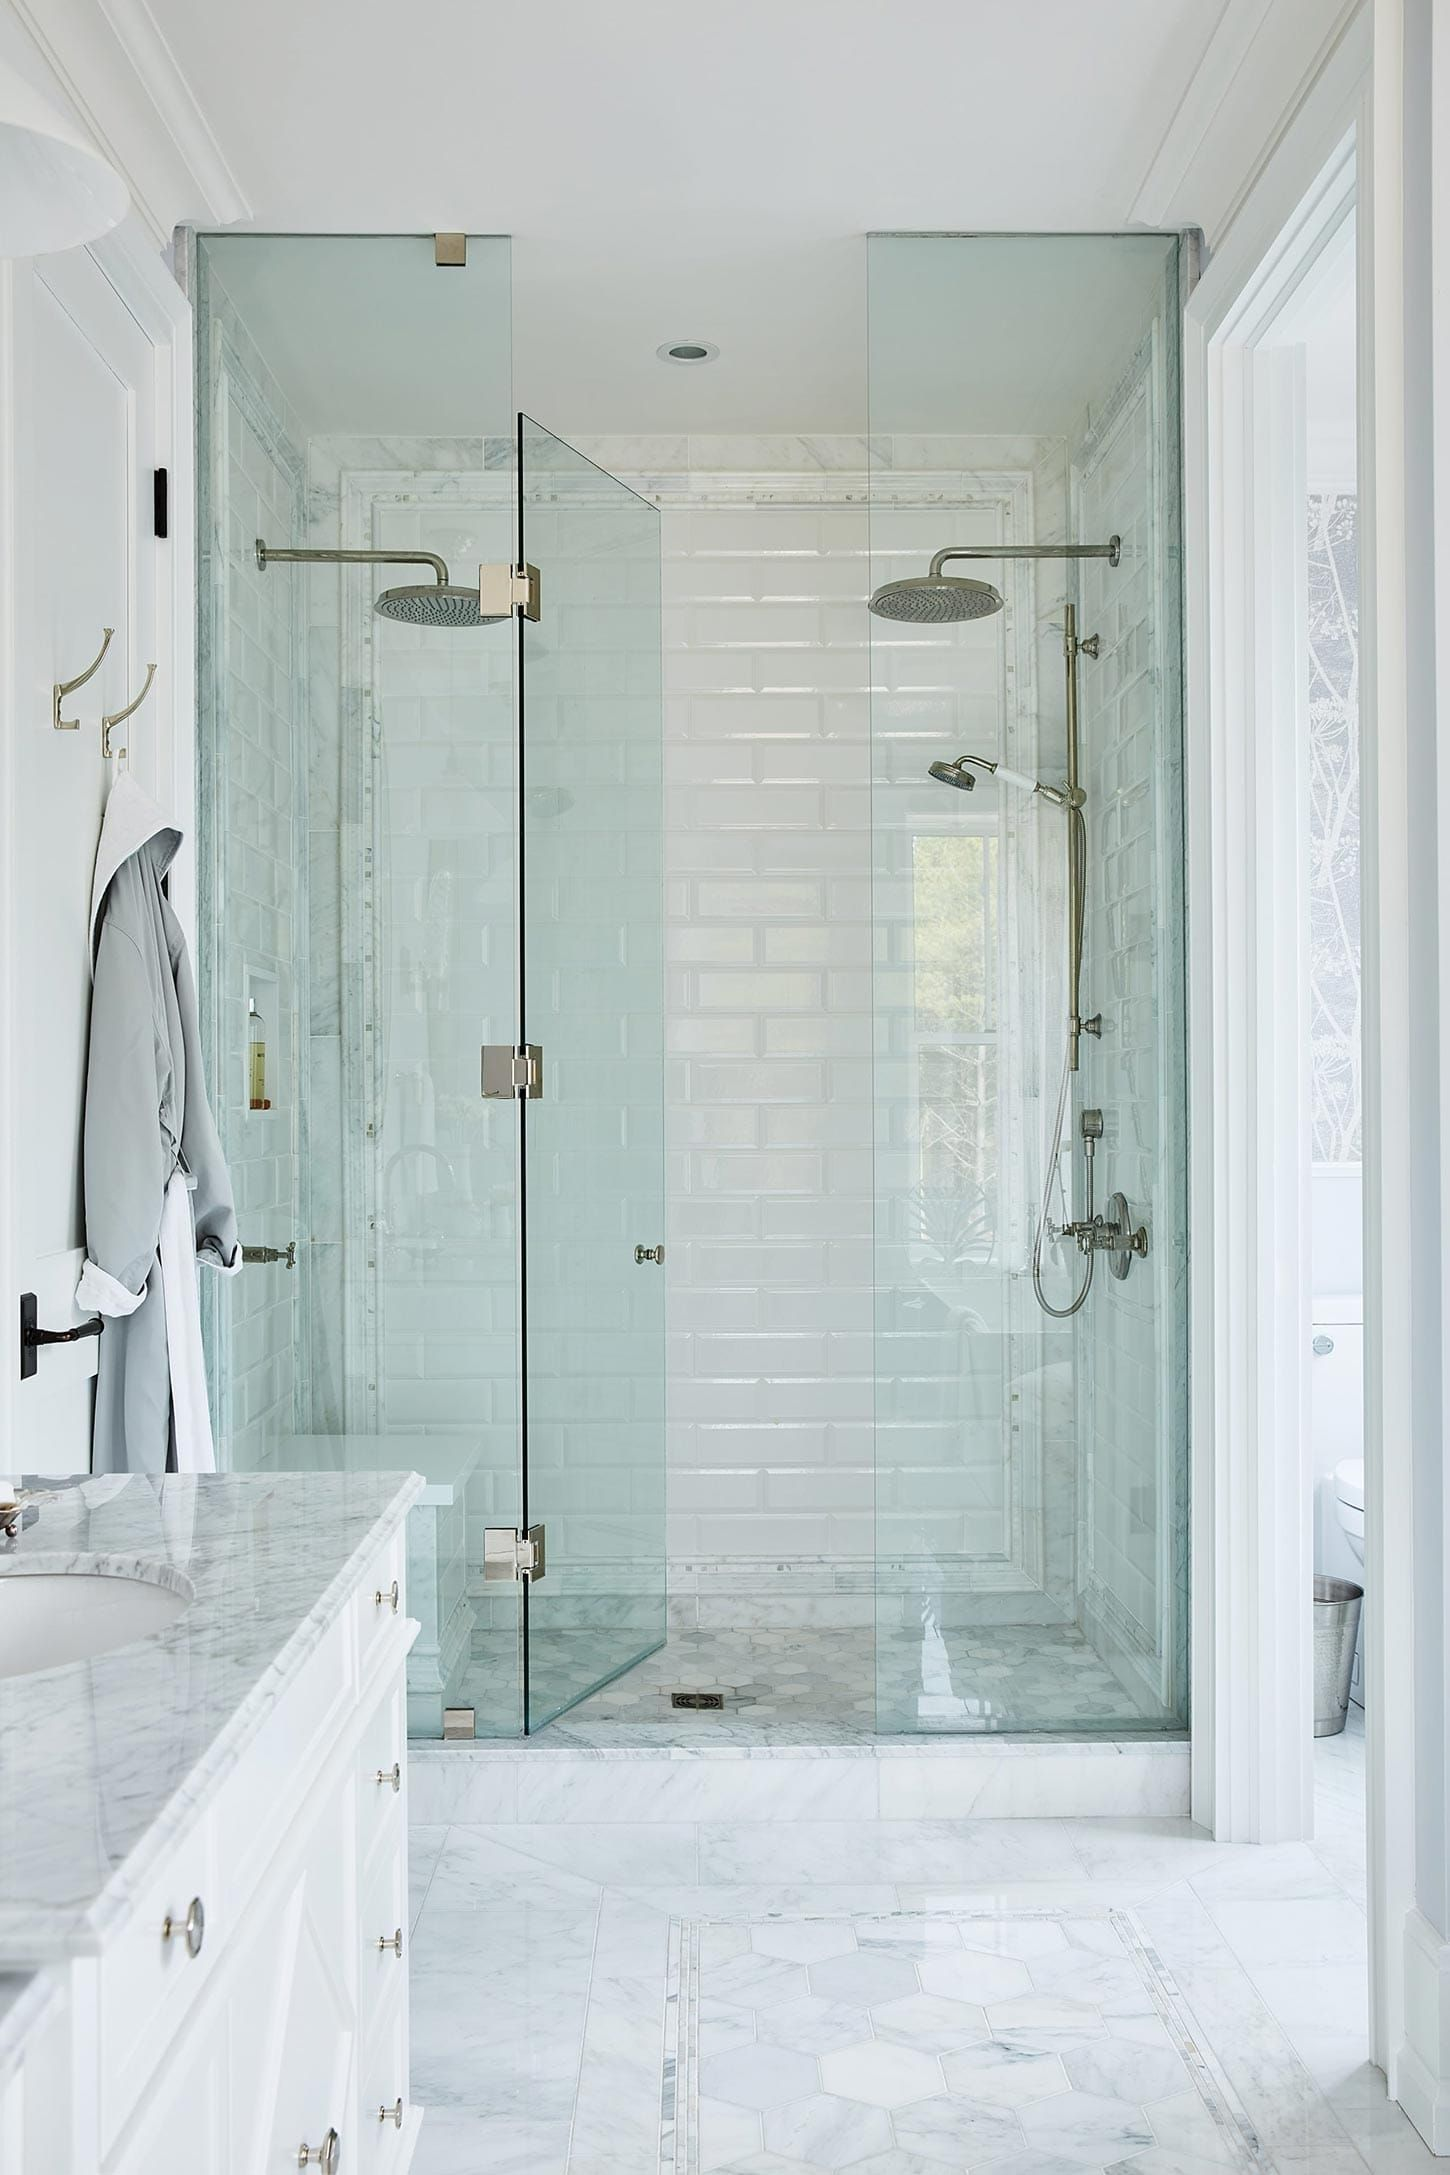 Hansgrohe Bathroom Sink Taps